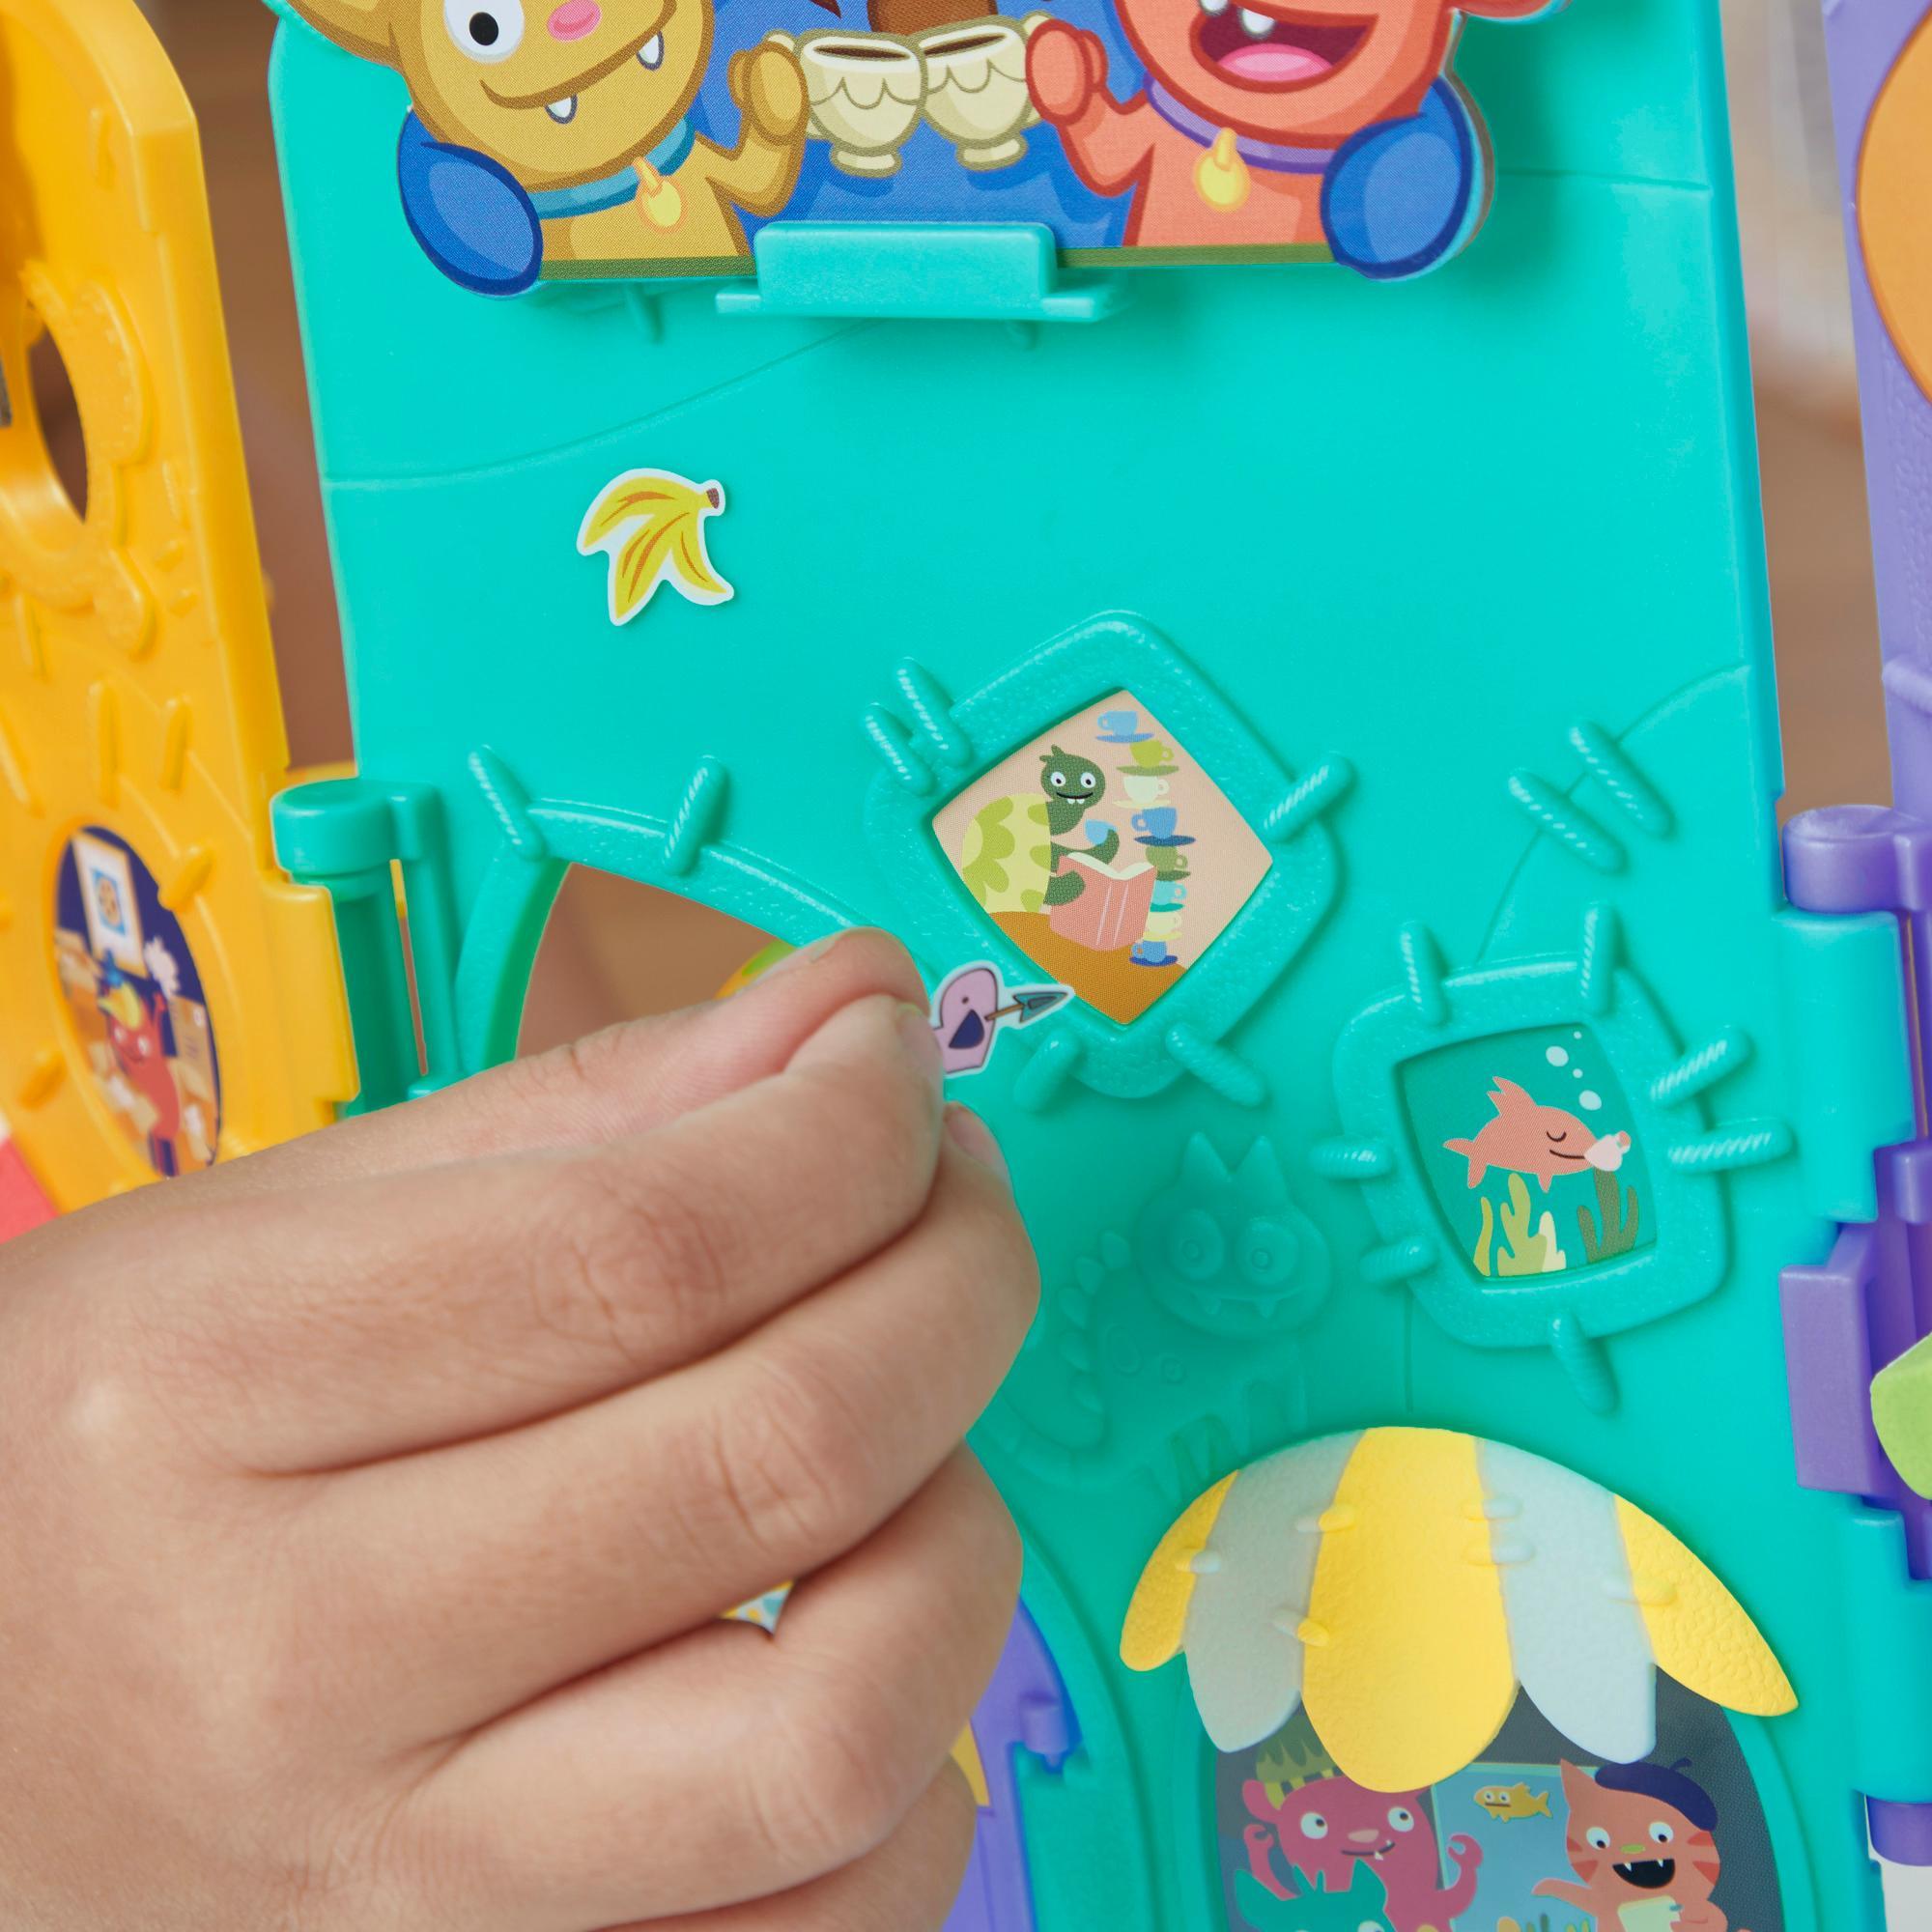 Ugly Dolls Product Thumb 11